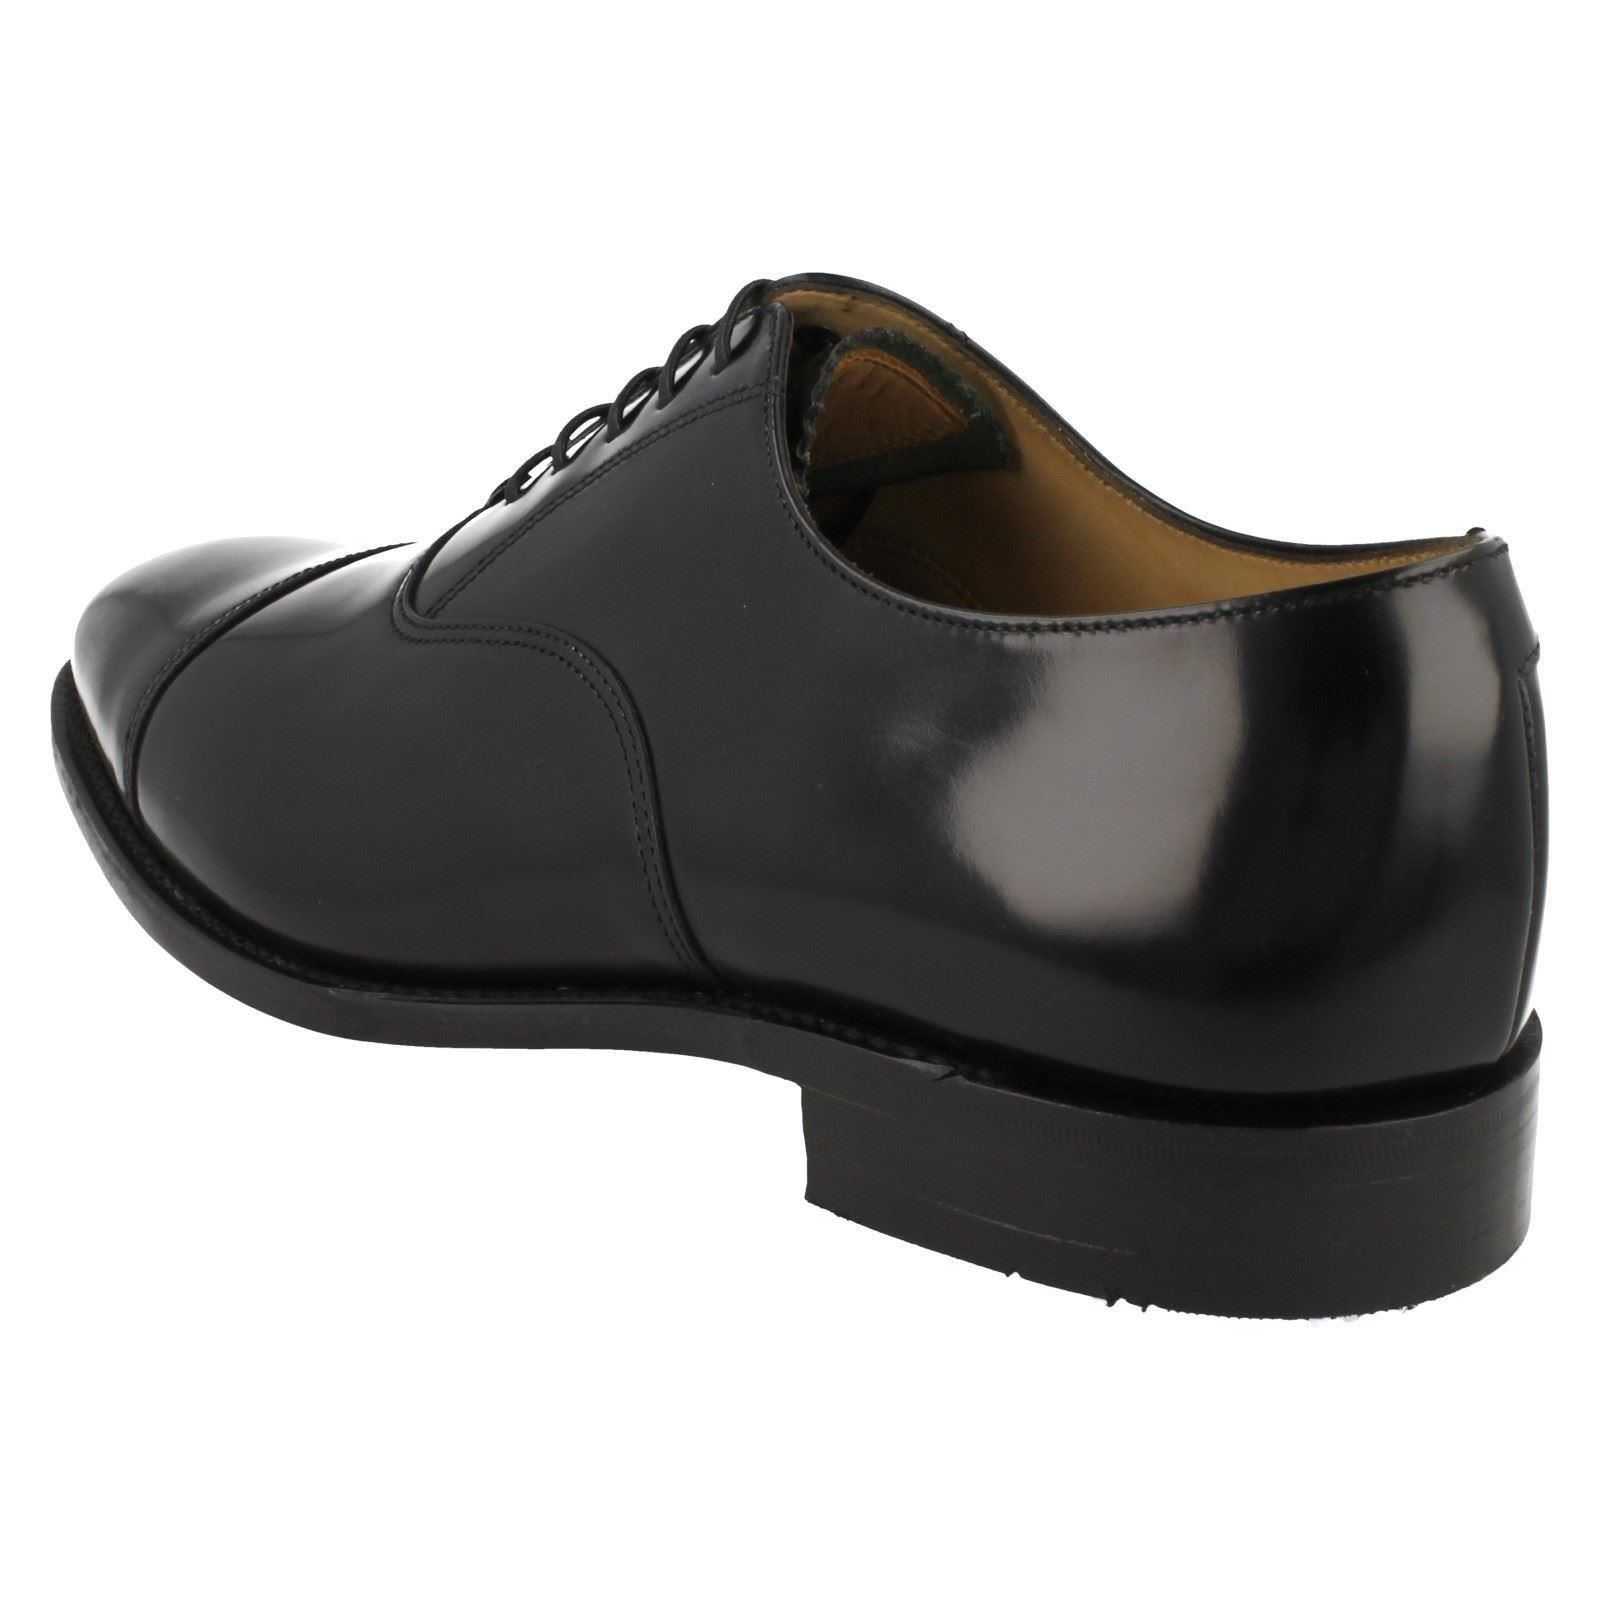 mens loake black formal shoes style 747b ebay